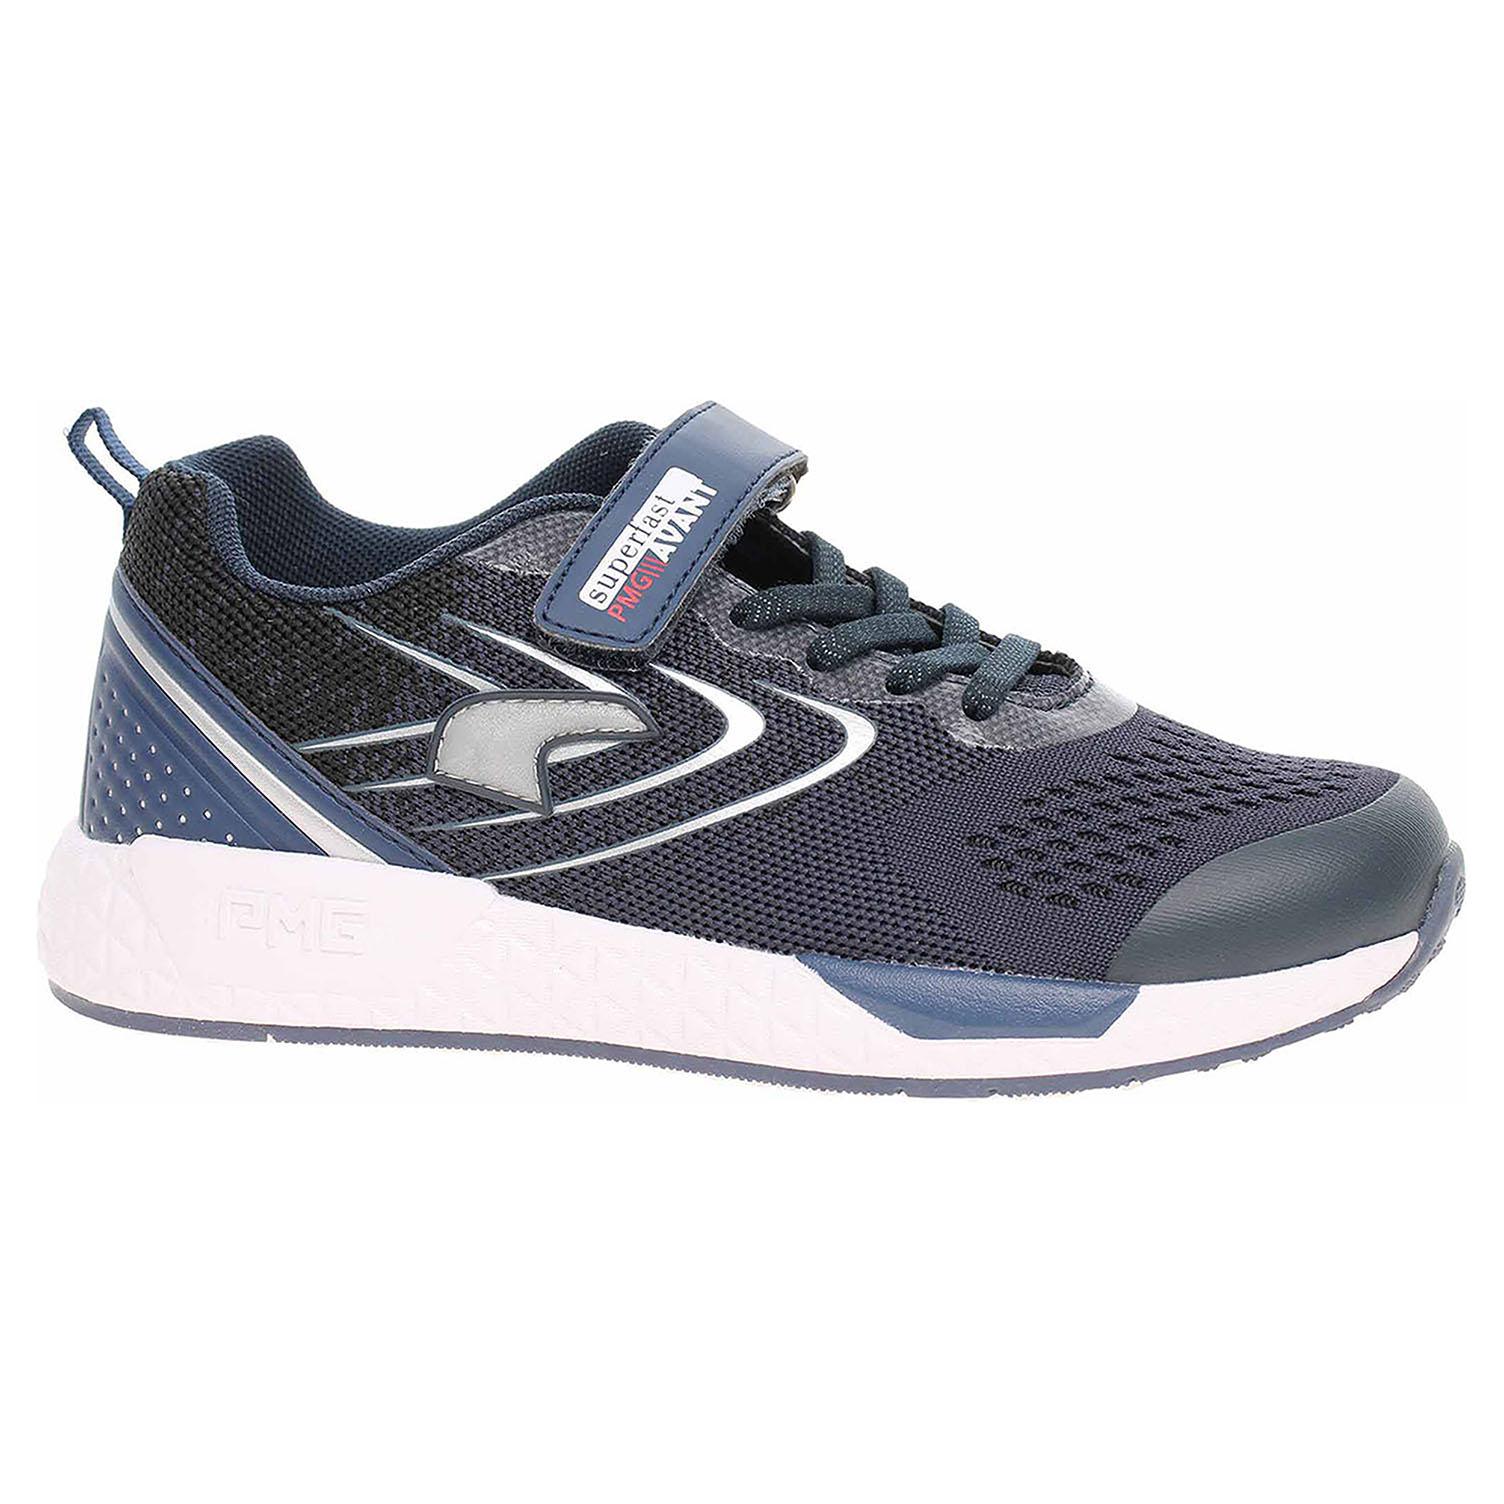 Chlapecká obuv Primigi 4456800 navy 4456800 34